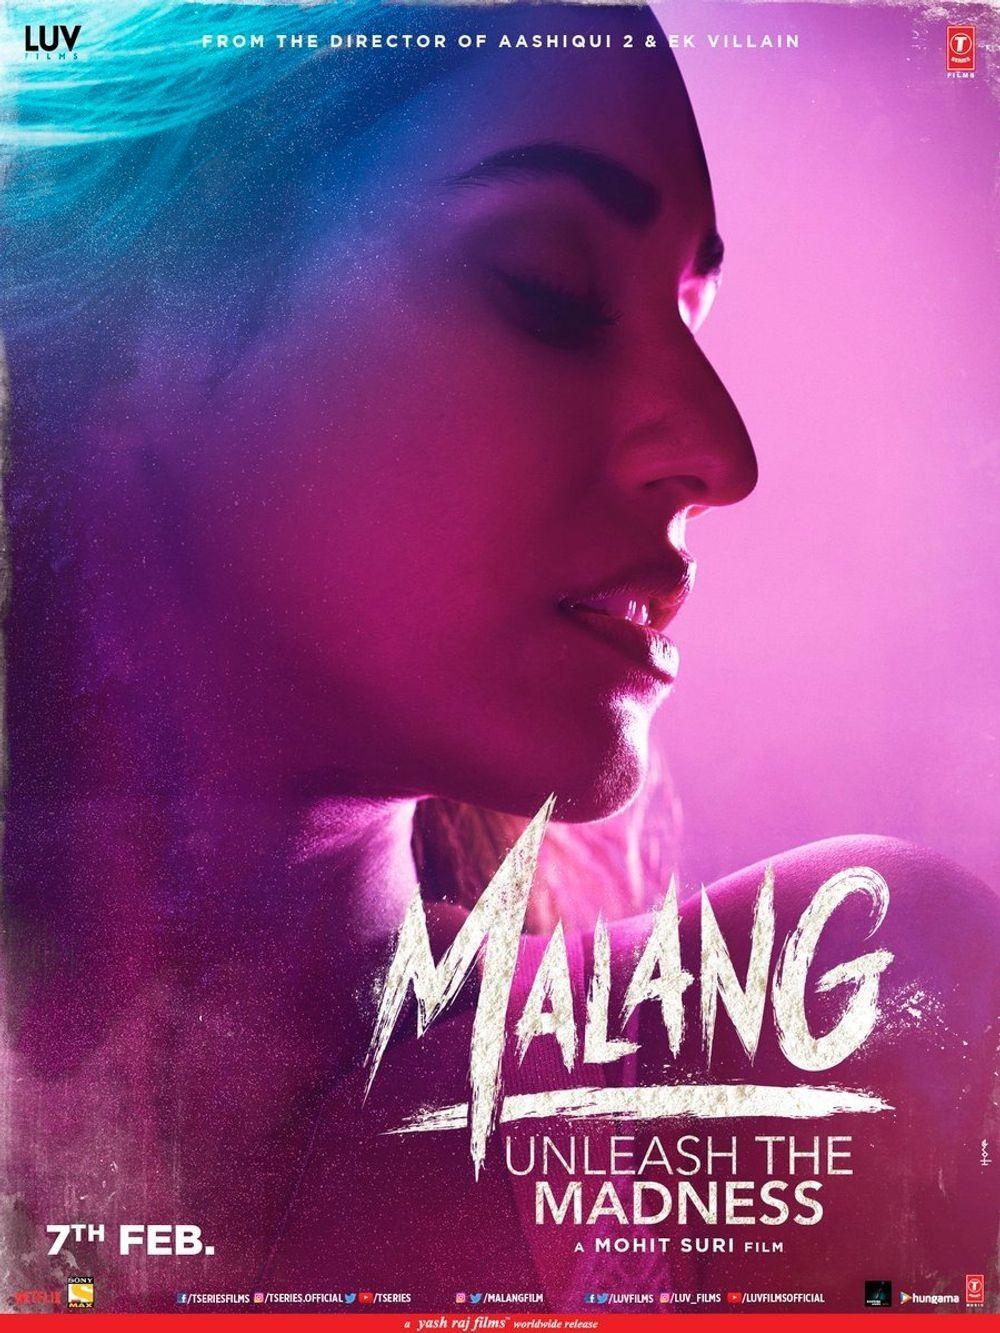 Malang Movie Latest Hd Photos Posters Wallpapers Malang Poster 1000x1333 Wallpaper Teahub Io